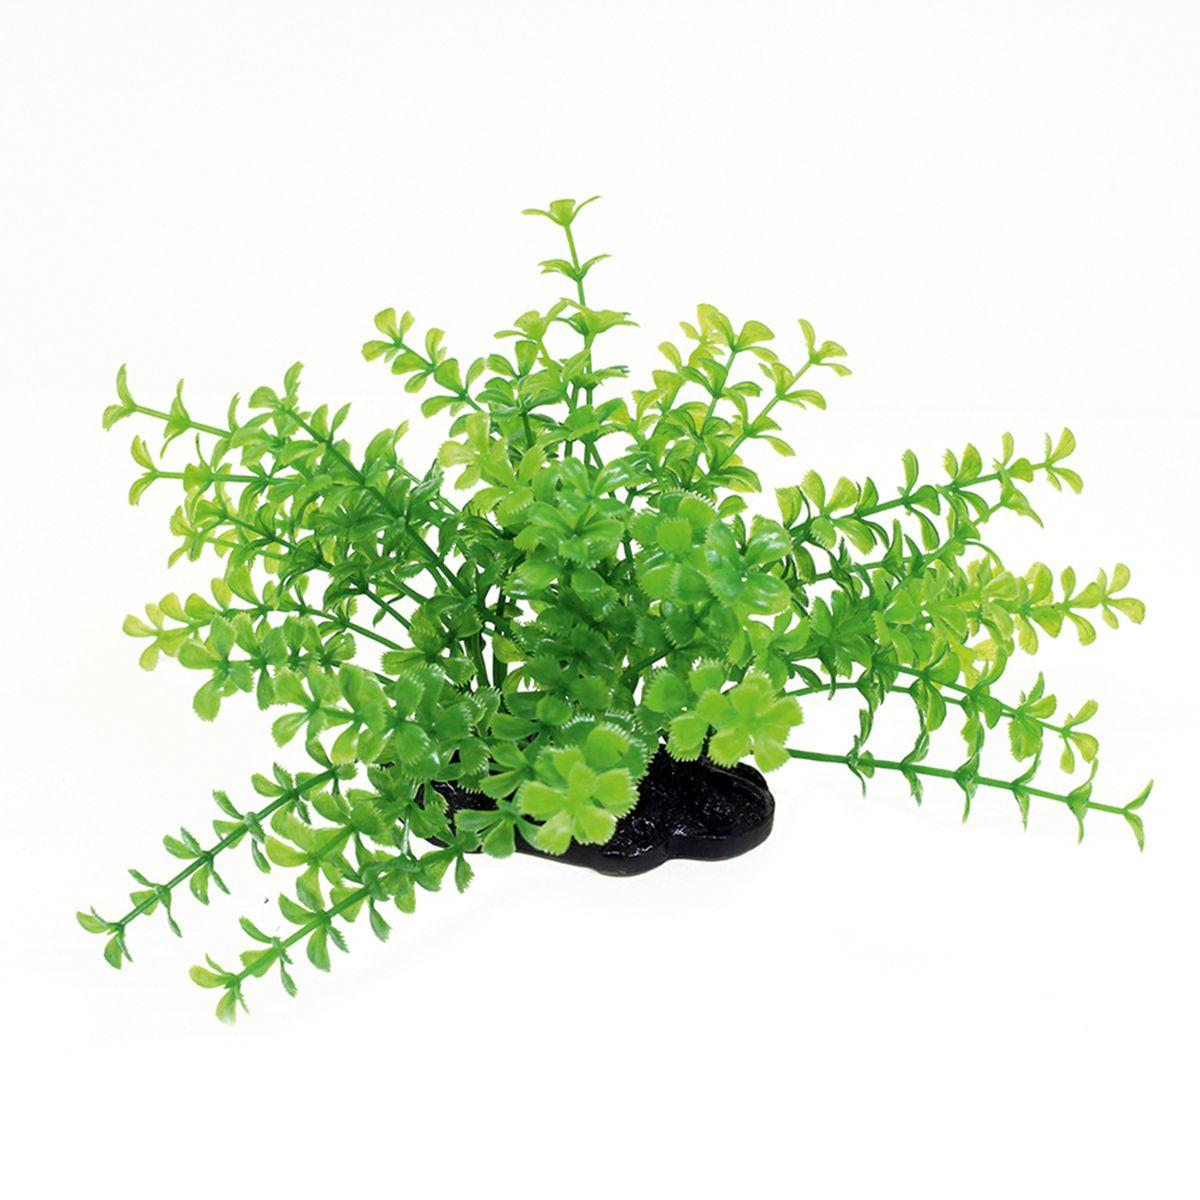 Растение для аквариума ArtUniq Прозерпинака зеленая, высота 10-12 смART-1192110Растение для аквариума ArtUniq Прозерпинака зеленая, высота 10-12 см